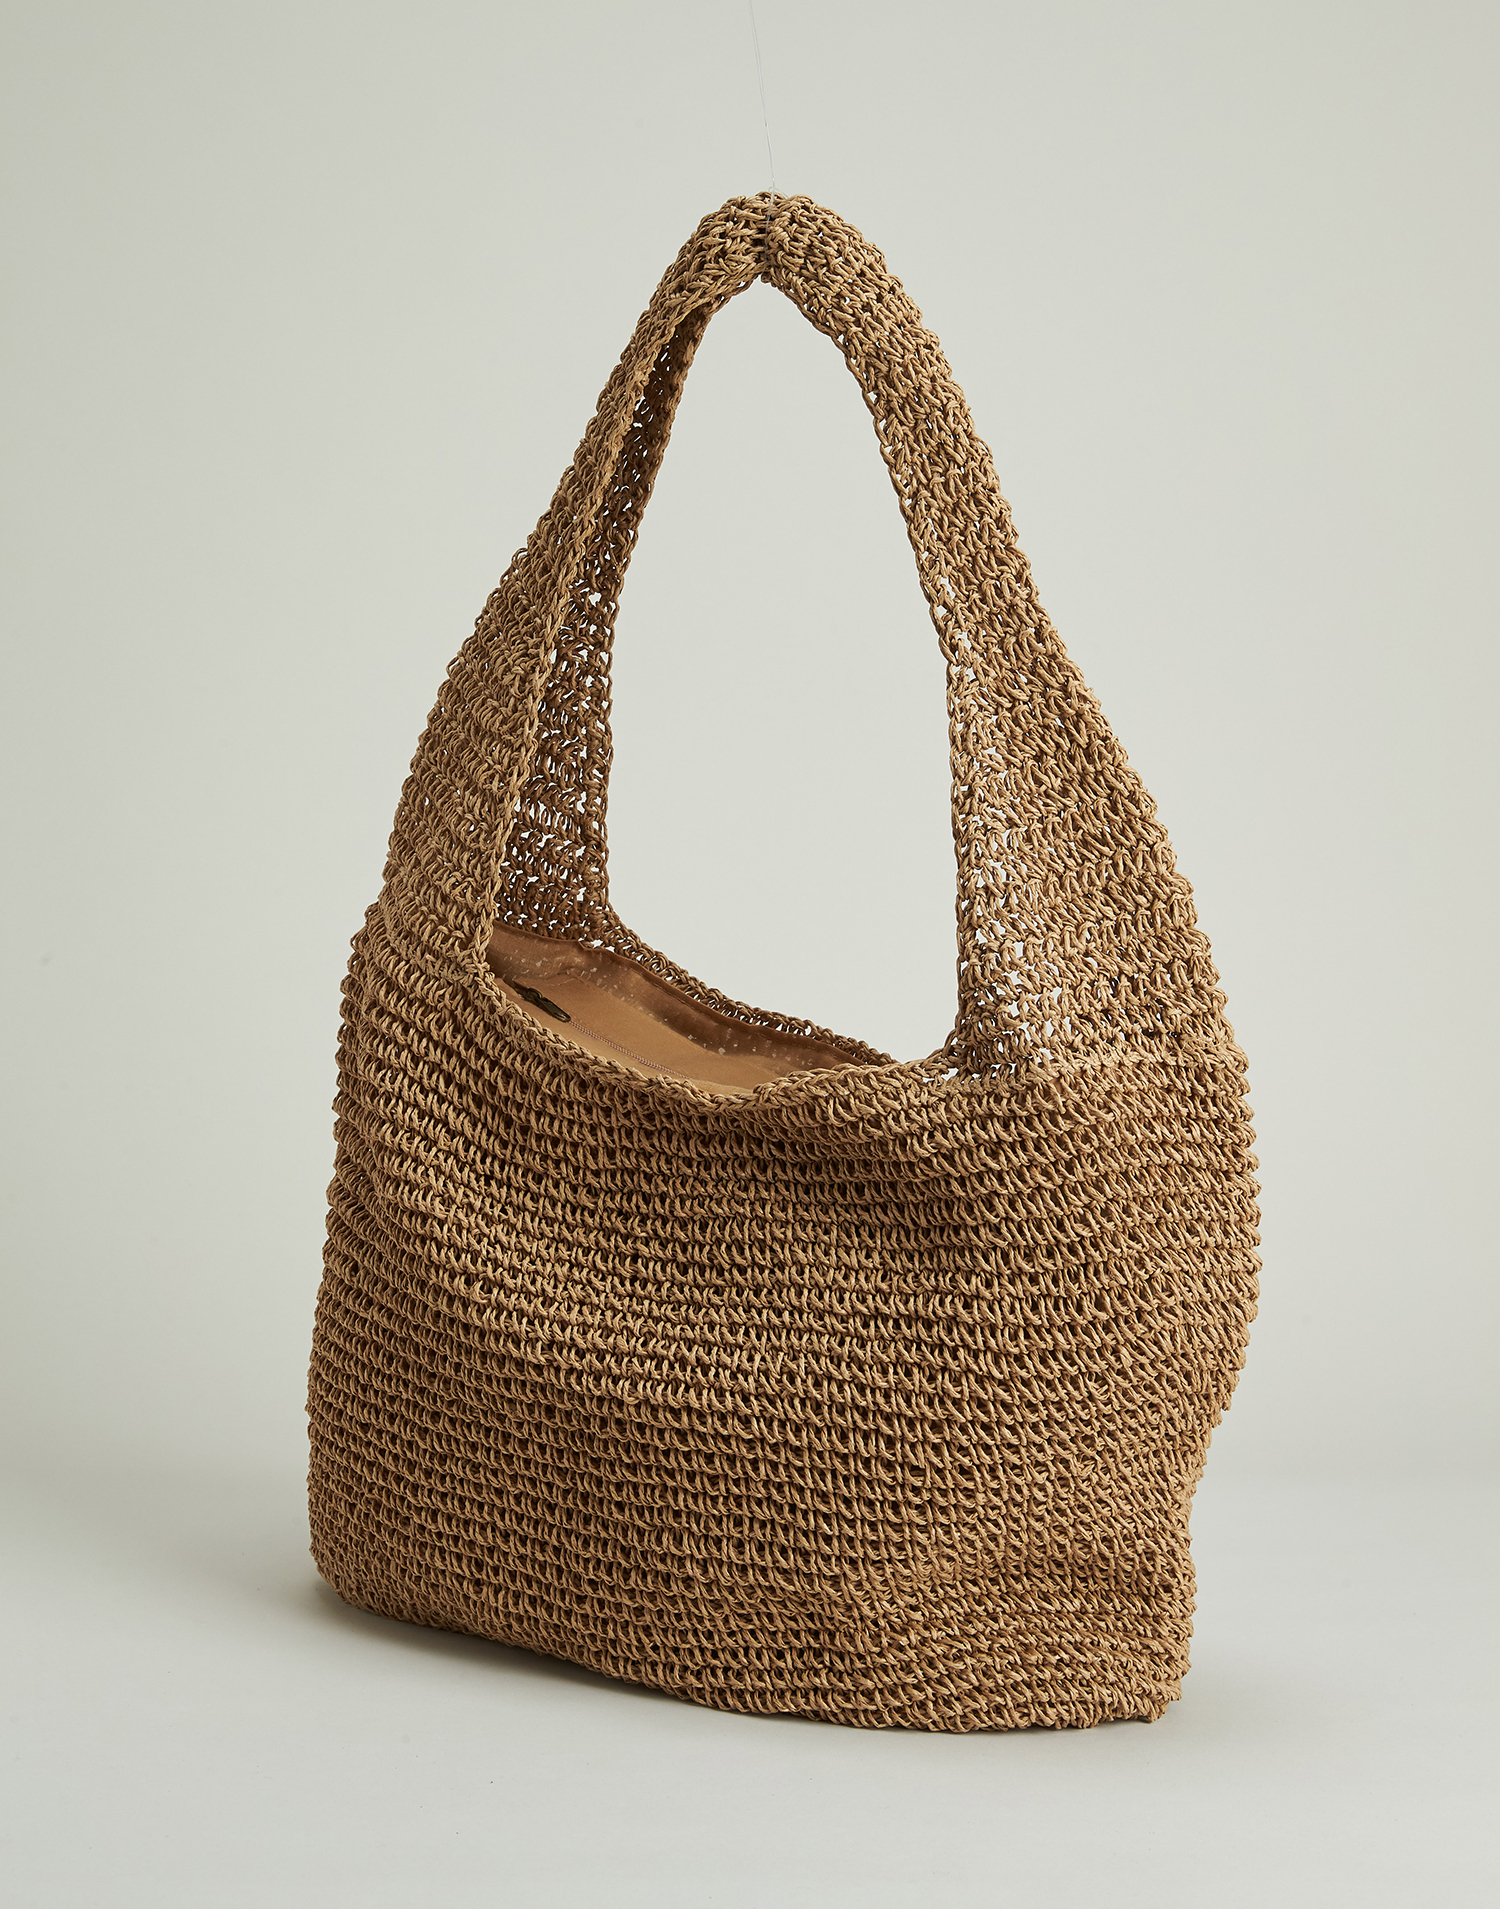 Paper hobo bag